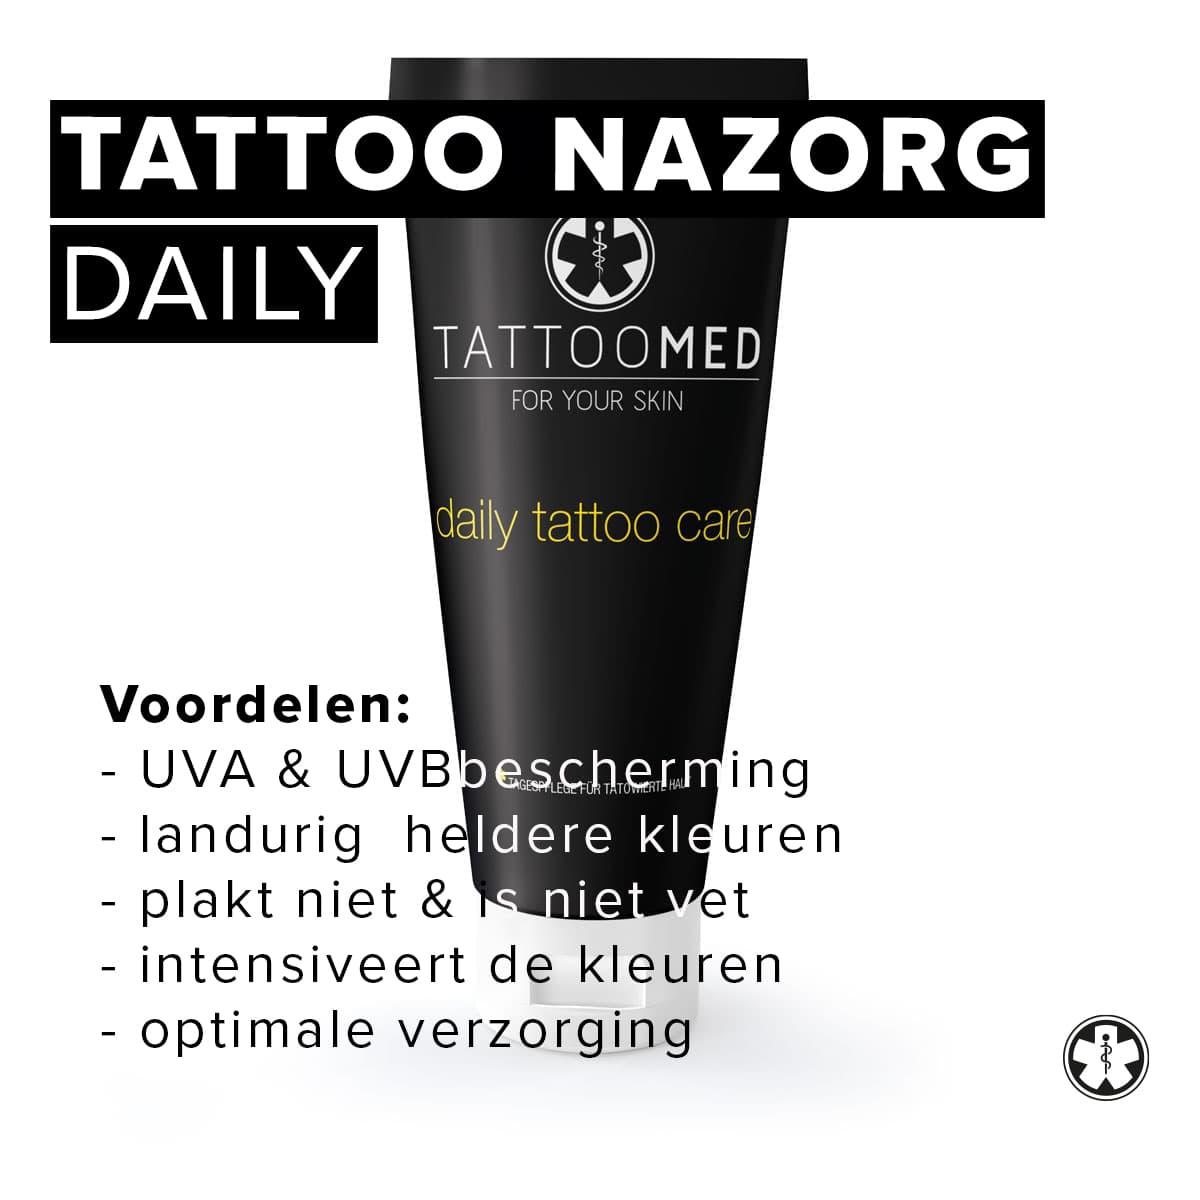 Daily Tattoo Care | Tattoo nazorg